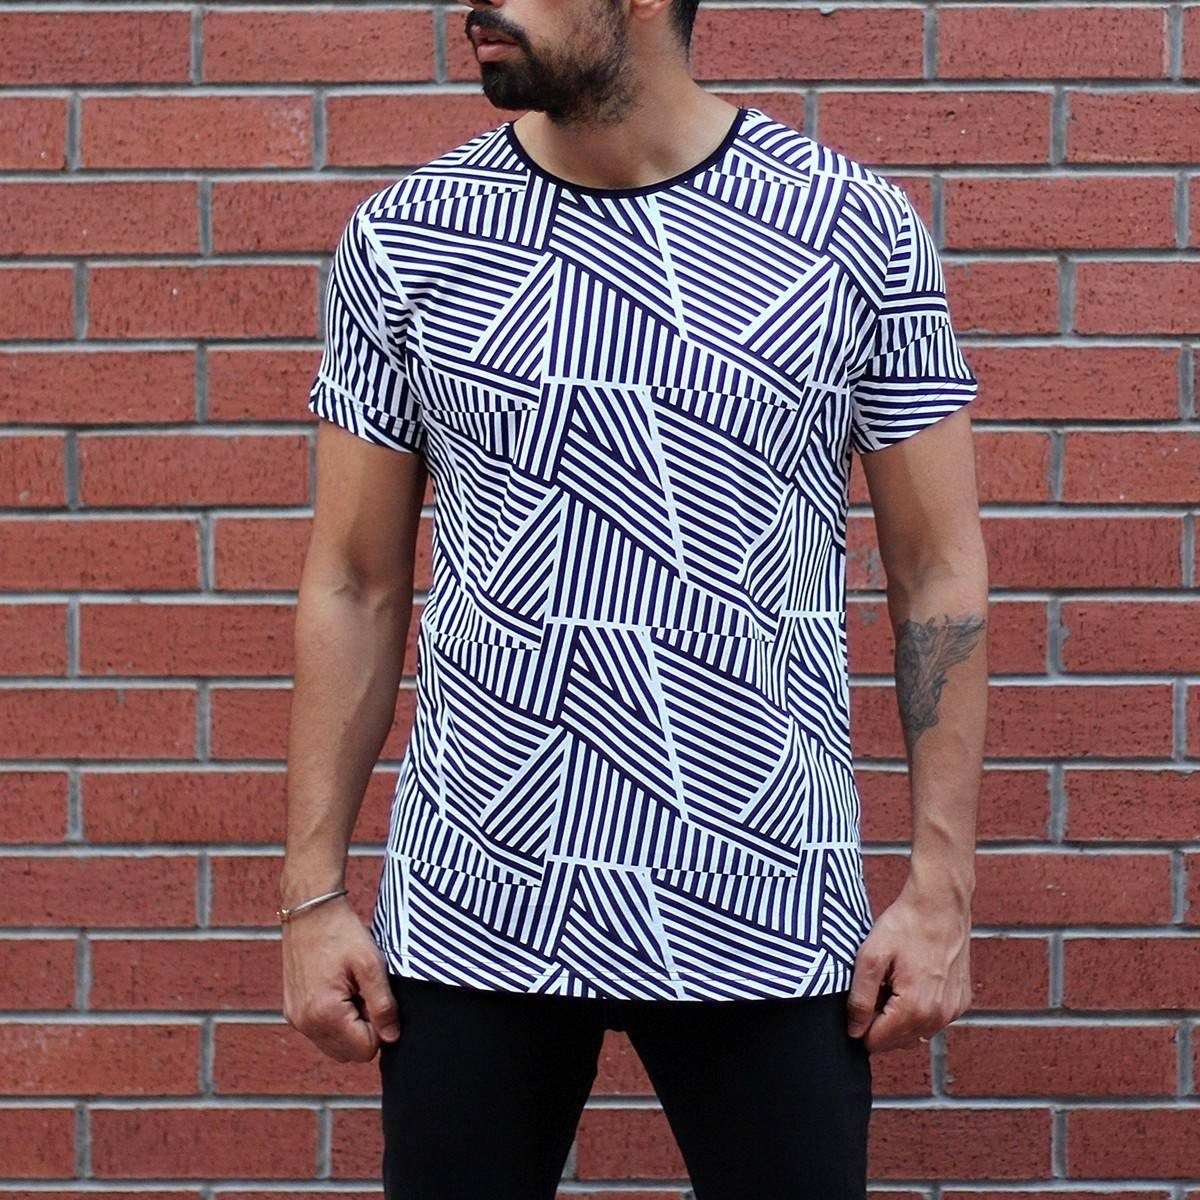 Men's Crew Neck Striped T-Shirt Black&White MV T-shirt Collection - 2